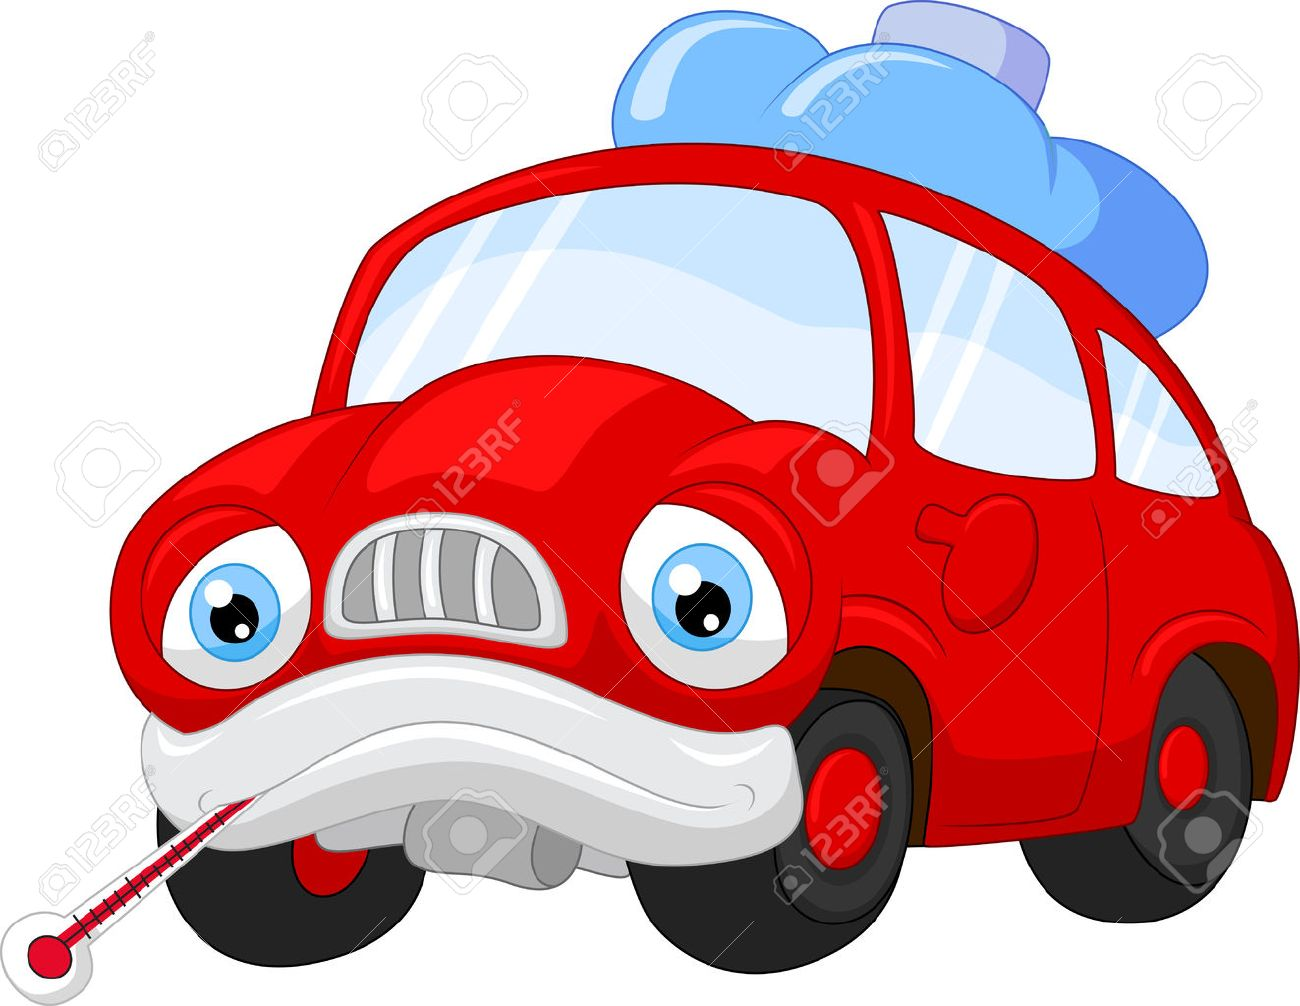 cartoon car character needing repair royalty free cliparts vectors